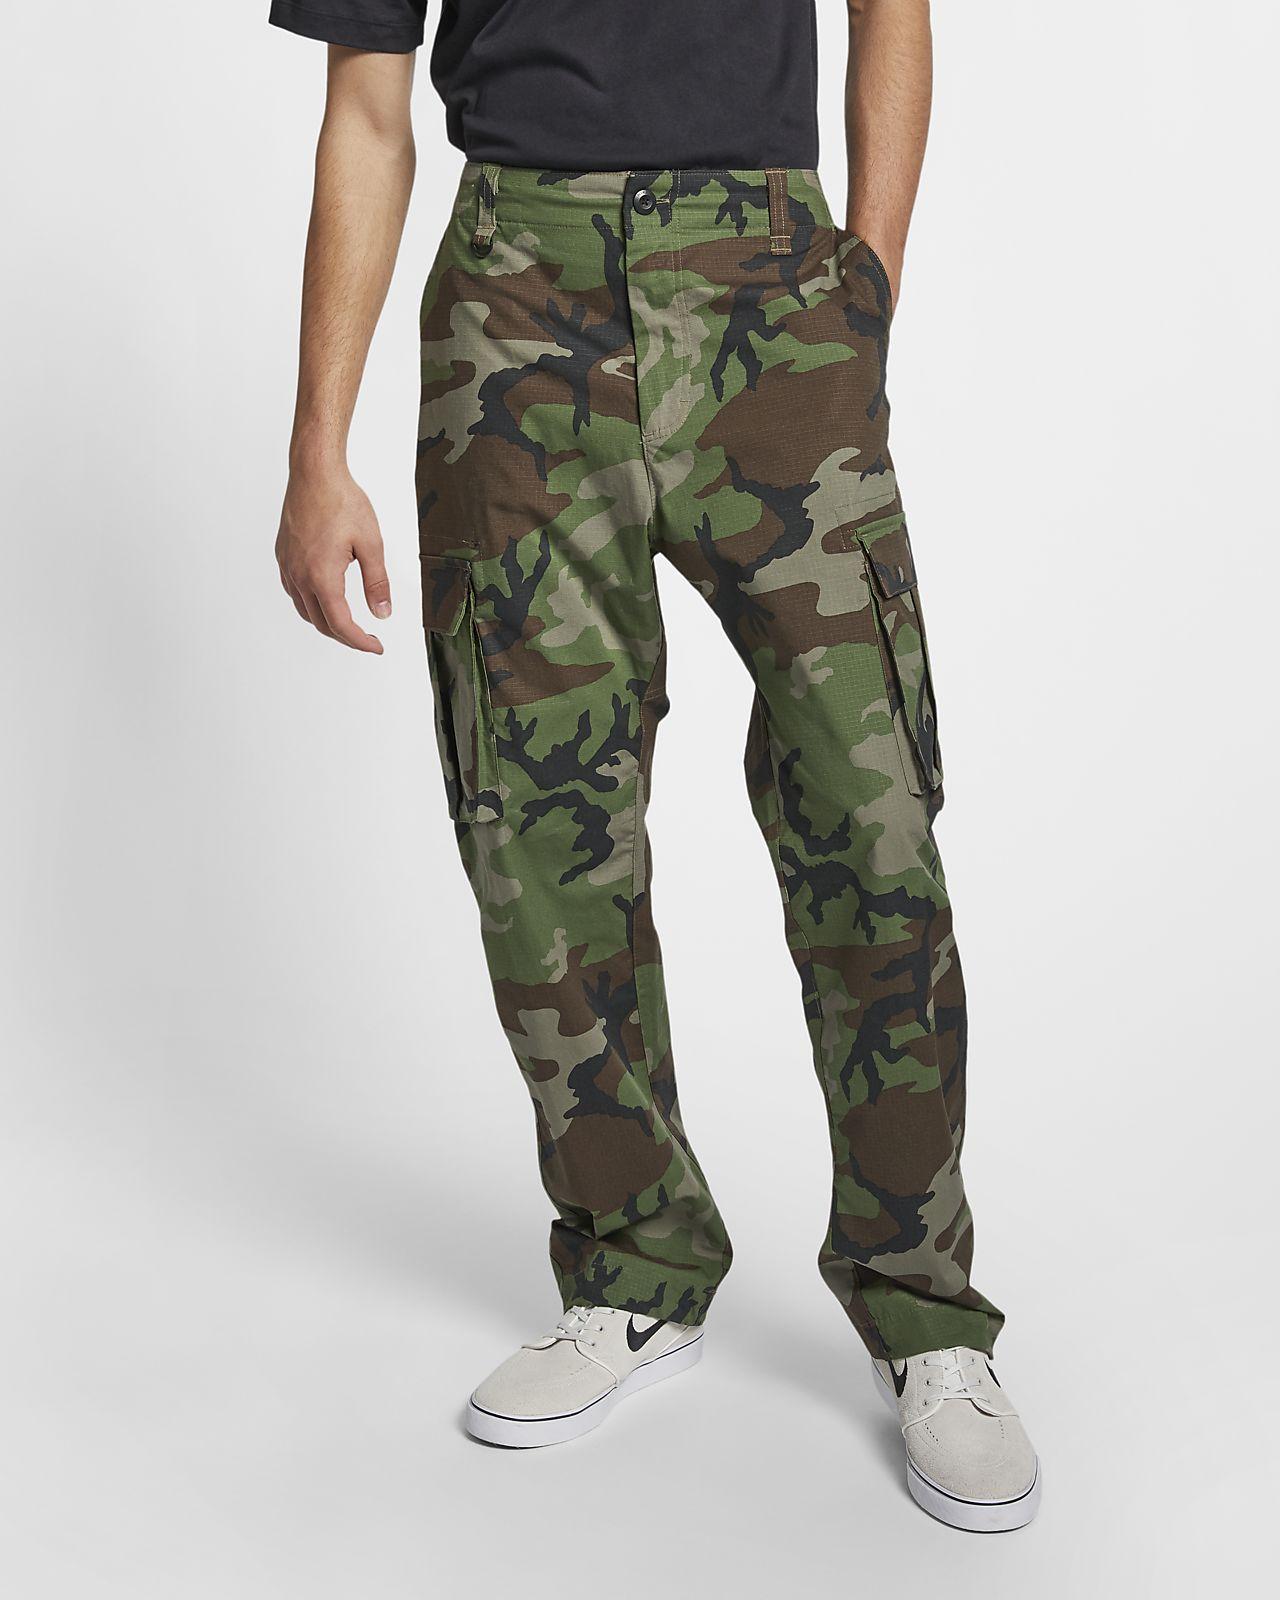 37181ee8df9d Nike SB Flex FTM Camo Skate Pants. Nike.com